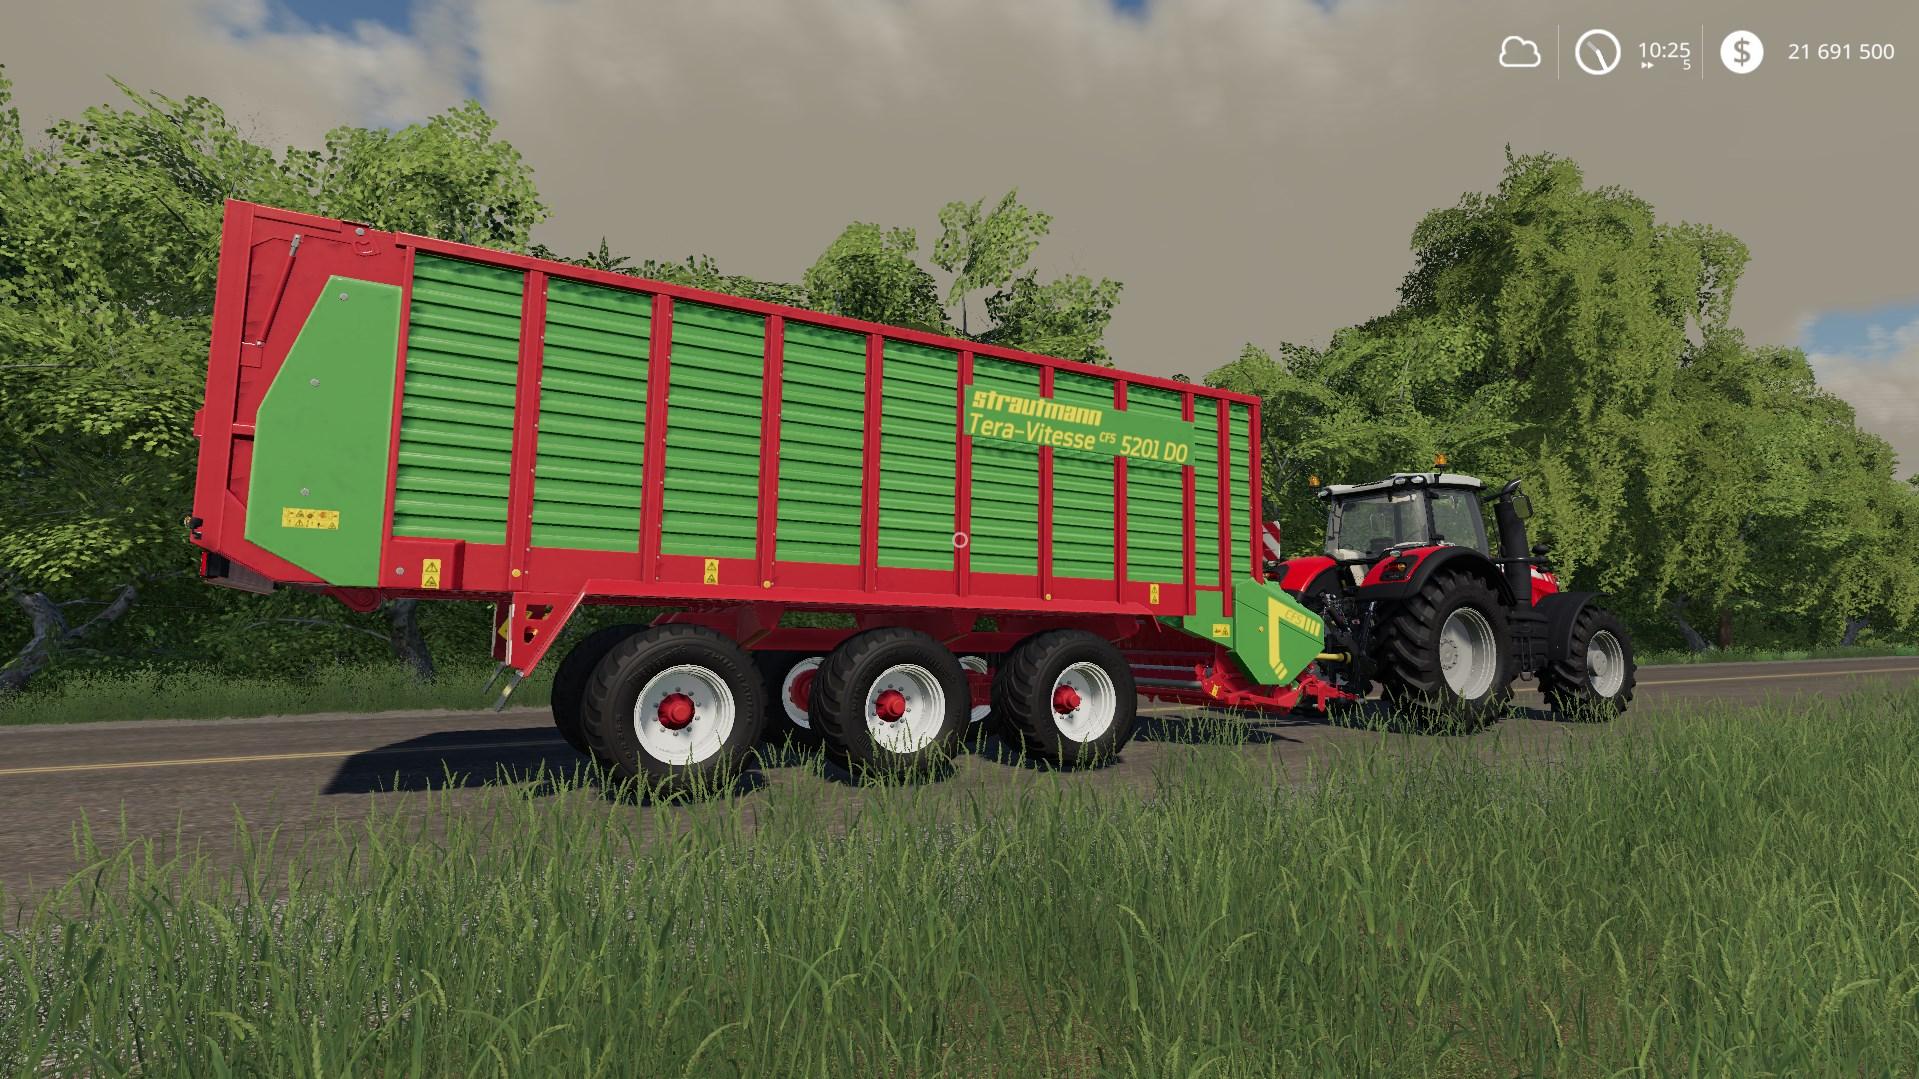 STRAUTMANN TERA-VITESSE CFS 5201 DO V1.0.0.0 для Farming Simulator 2019